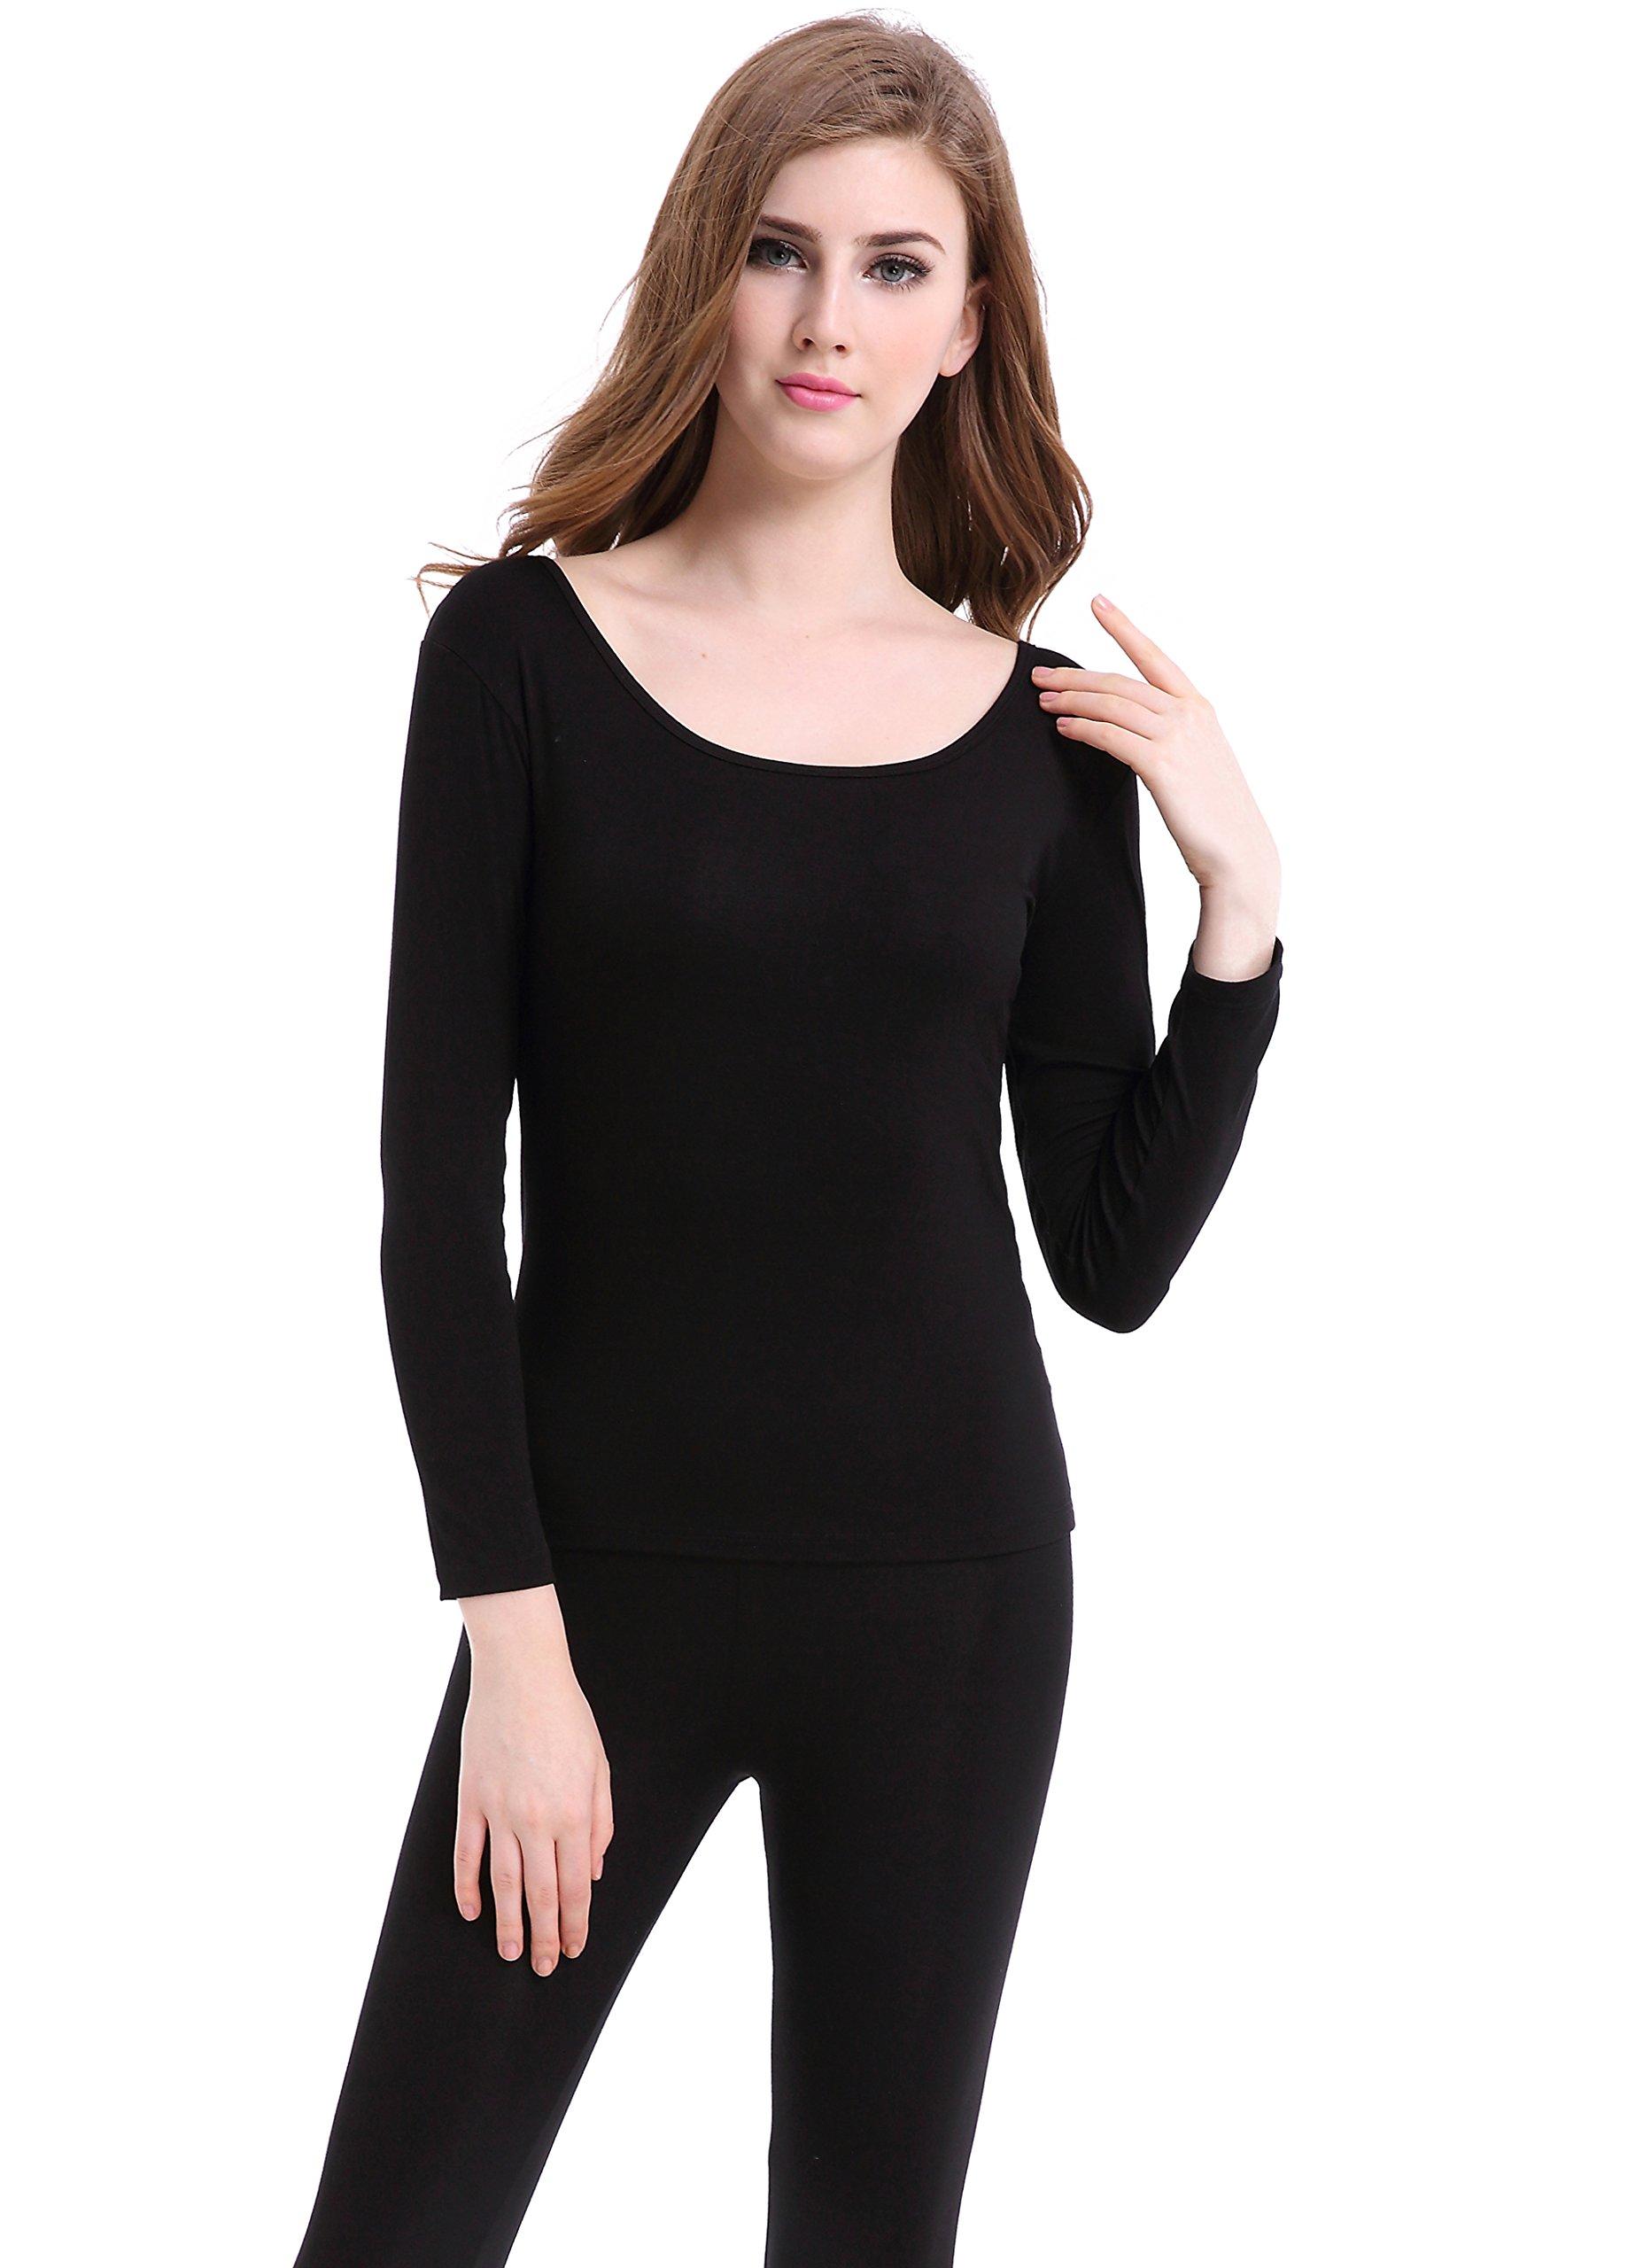 Thermal Underwear Women Long - Scoop Neck Ultra - Thin Johns Set Top & Bottom